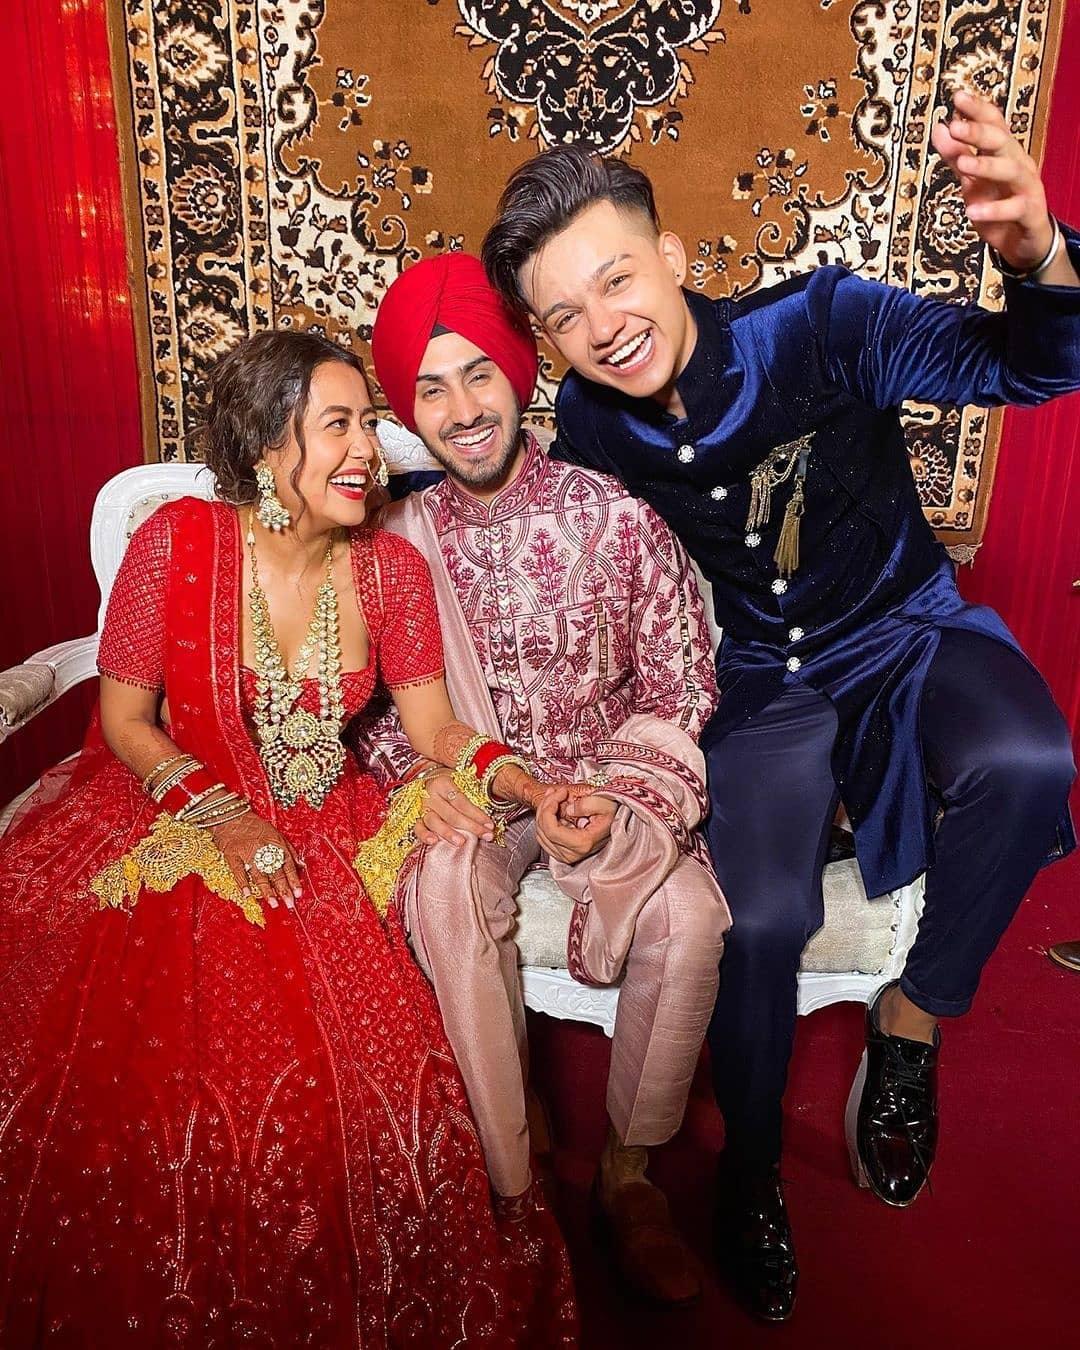 Famous Indian Singer Neha Kakkar tied the knot with Singer Rohan Preet